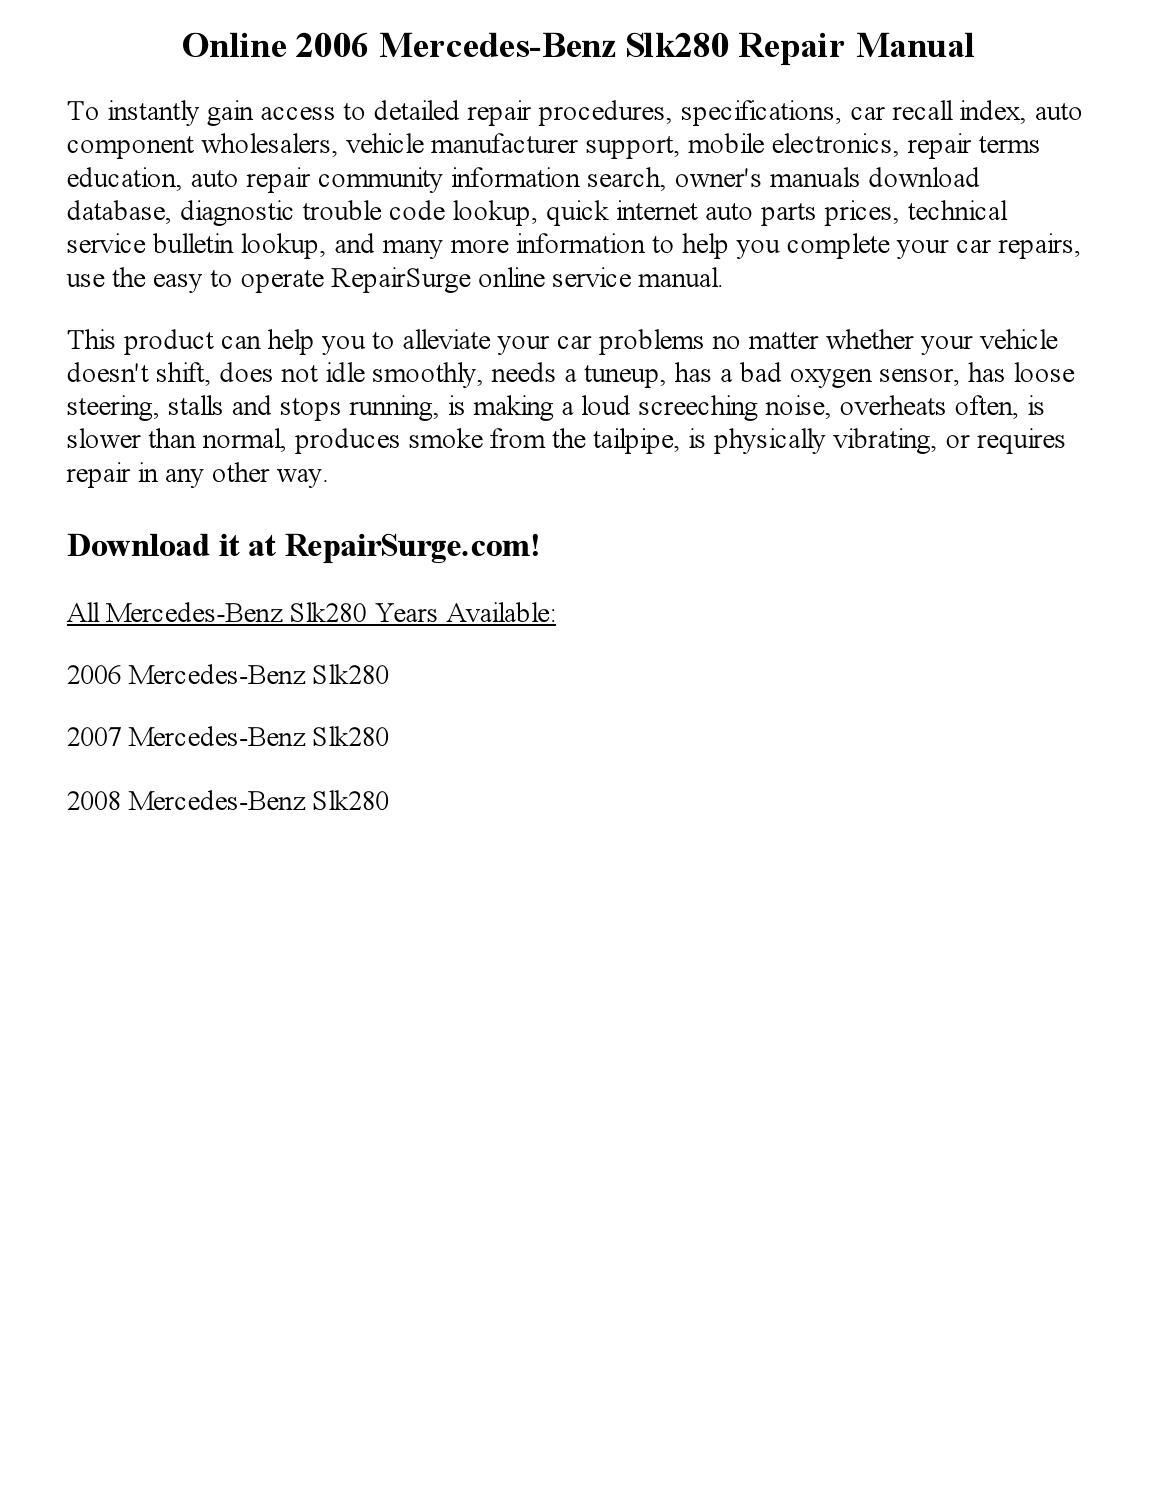 Cool Reznor F75 Tiny Hss Wiring Regular Bulldog Security System Hh Strat Wiring Old Remote Starter Diagram FreshIbanez Gsr100 Bass 2006 Mercedes Benz Slk280 Repair Manual Online By Andrewguild999 ..